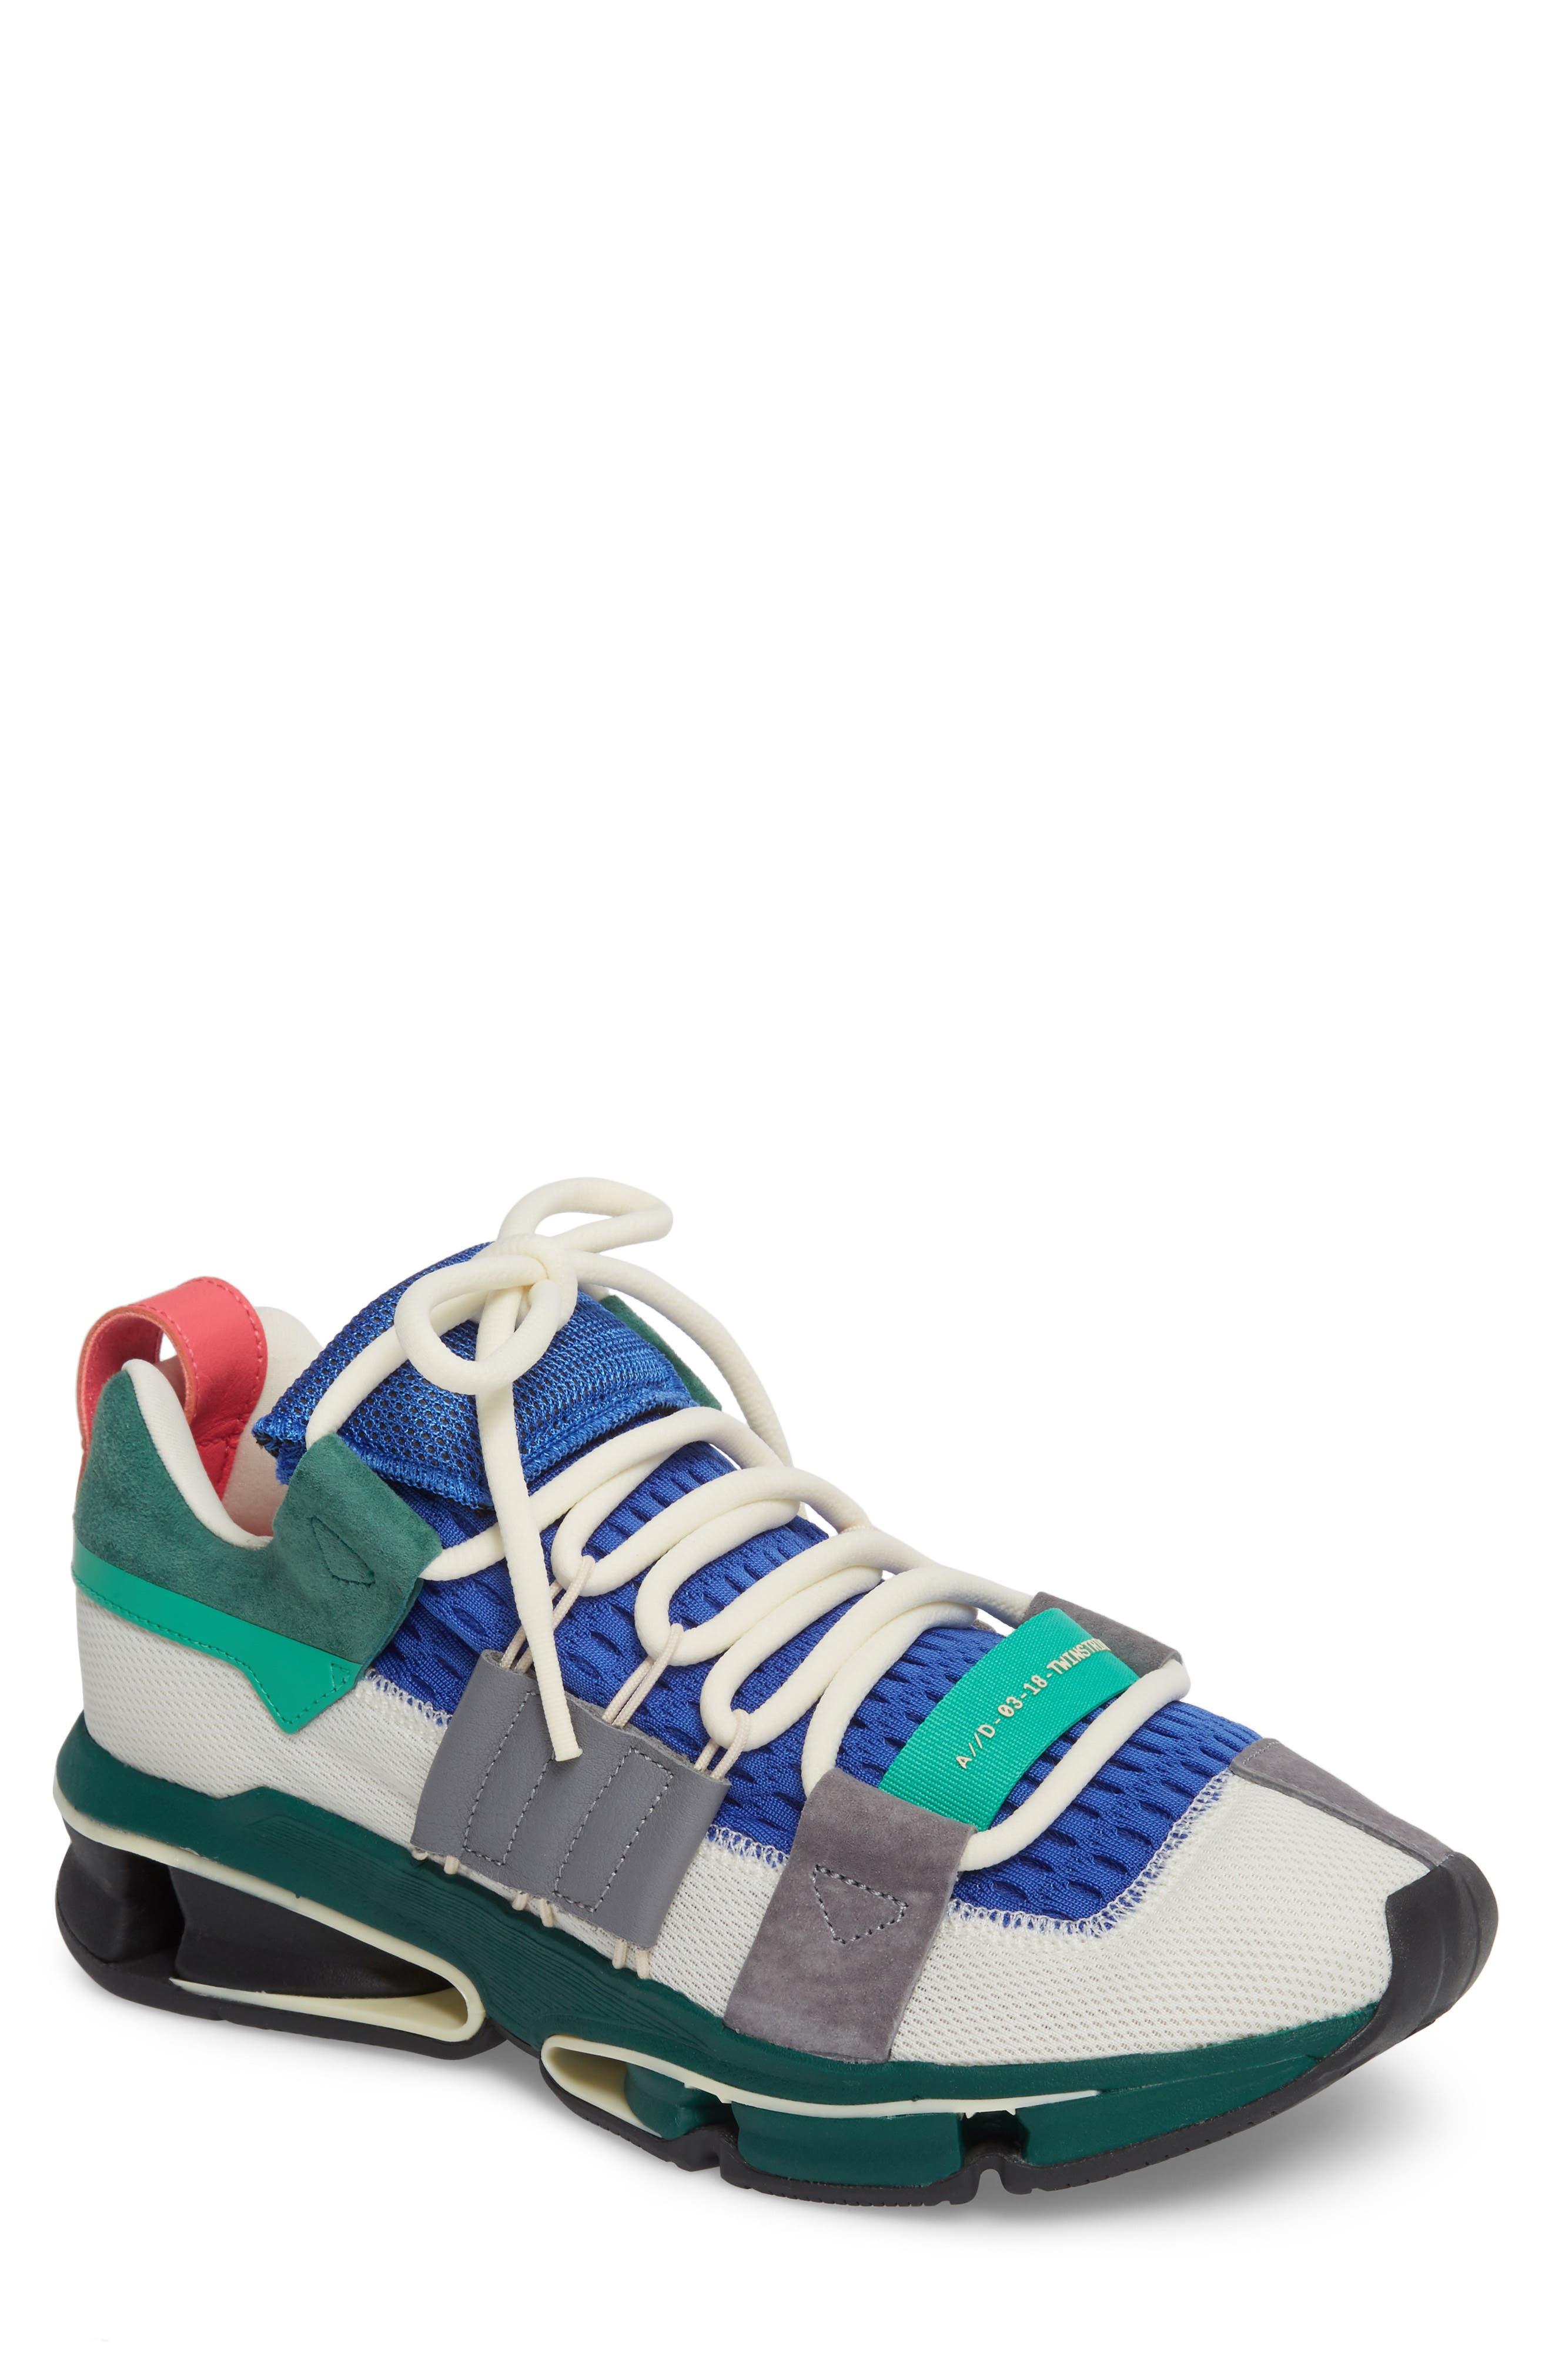 Twinstrike ADV Sneaker,                         Main,                         color, 400